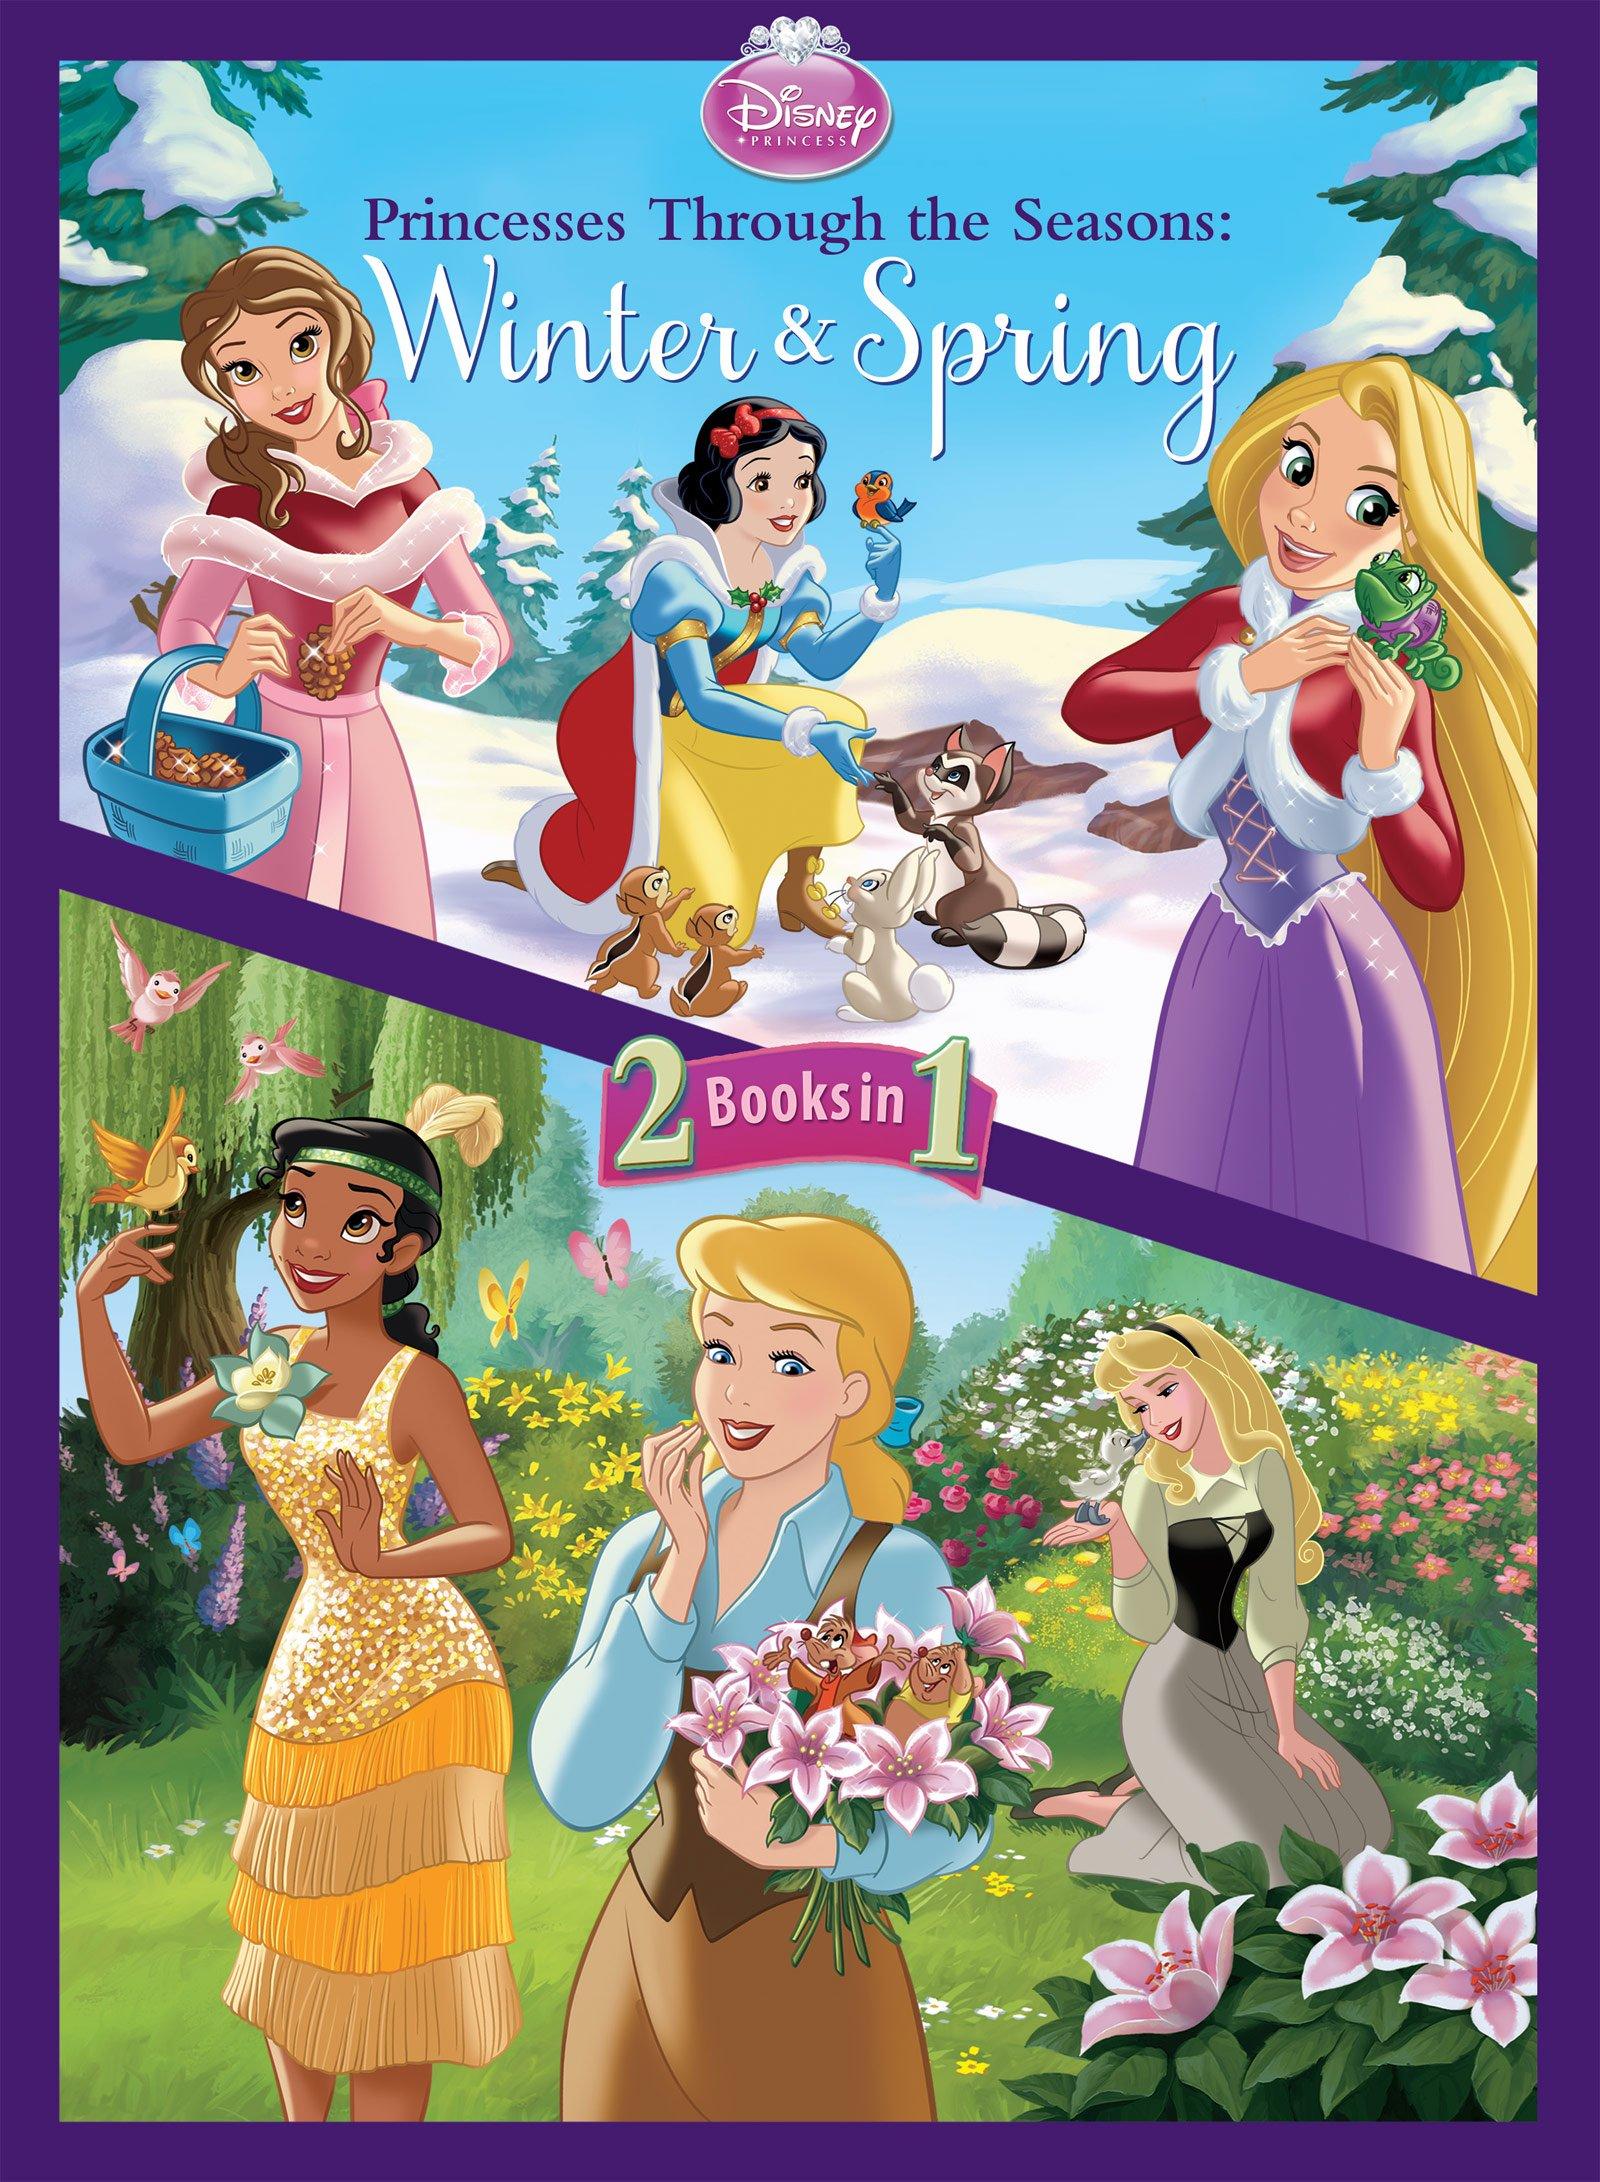 Disney Princess Princesses Through The Seasons Disney